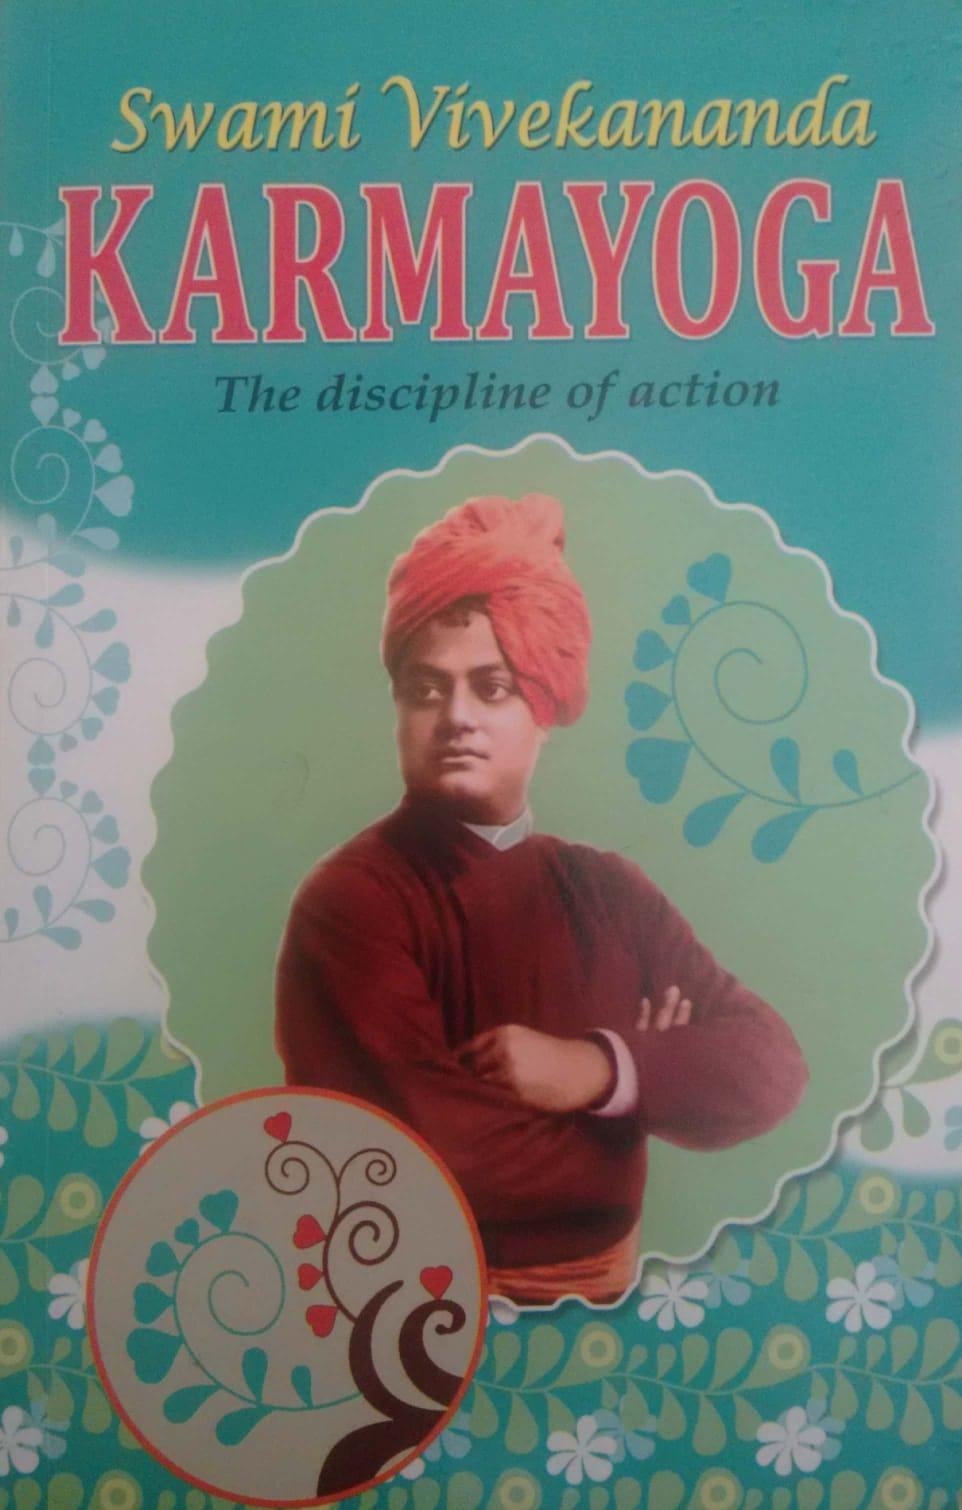 Swami Vivekanand KARMAYOGA The Discipline Of Action